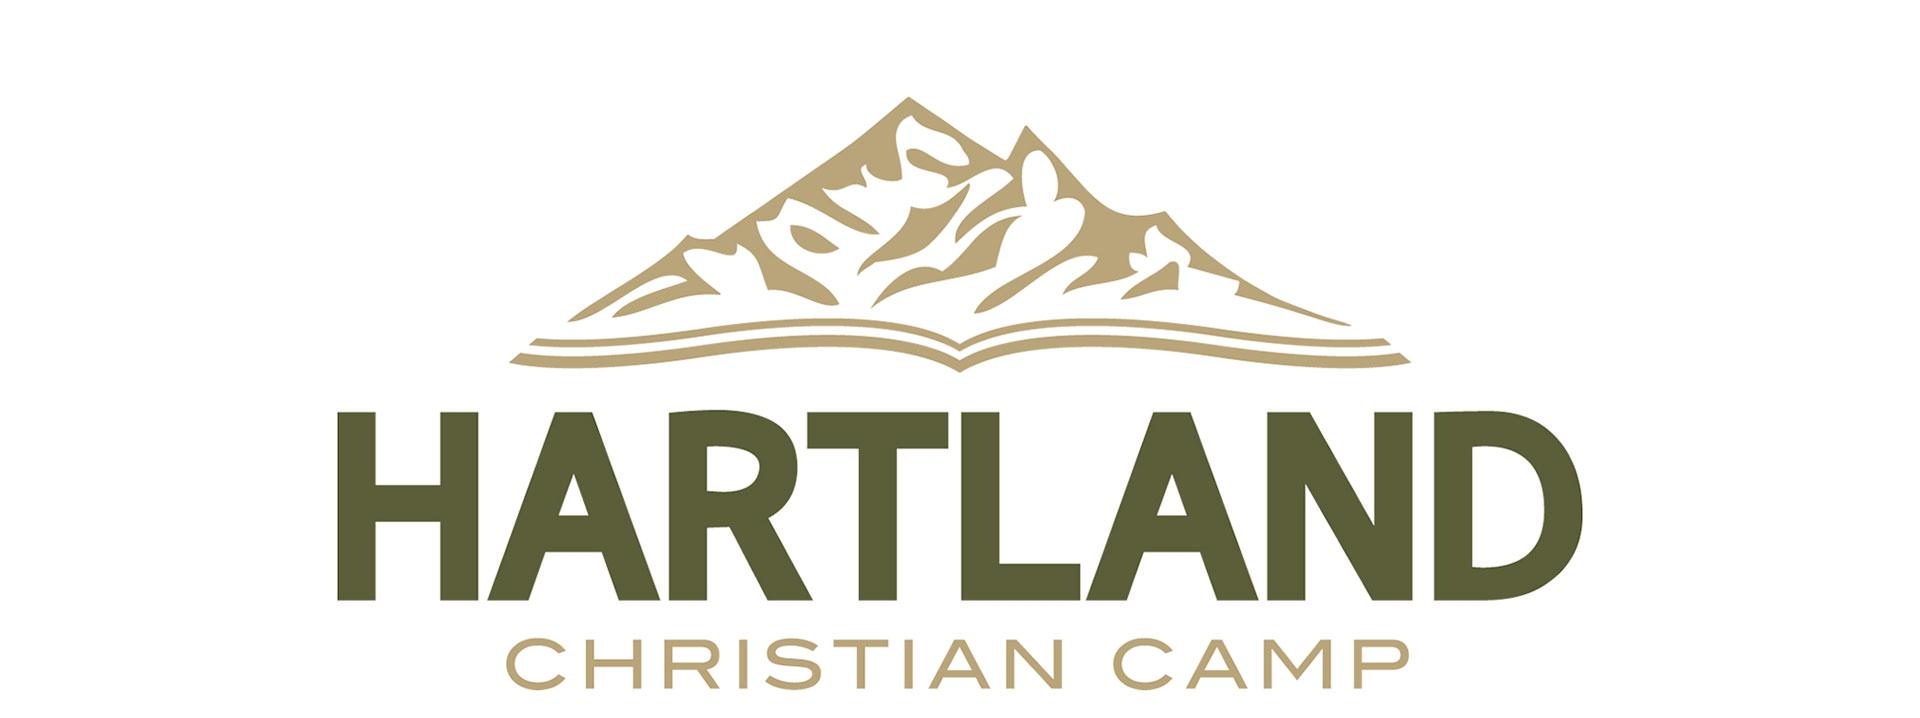 Hartland Christian Camp